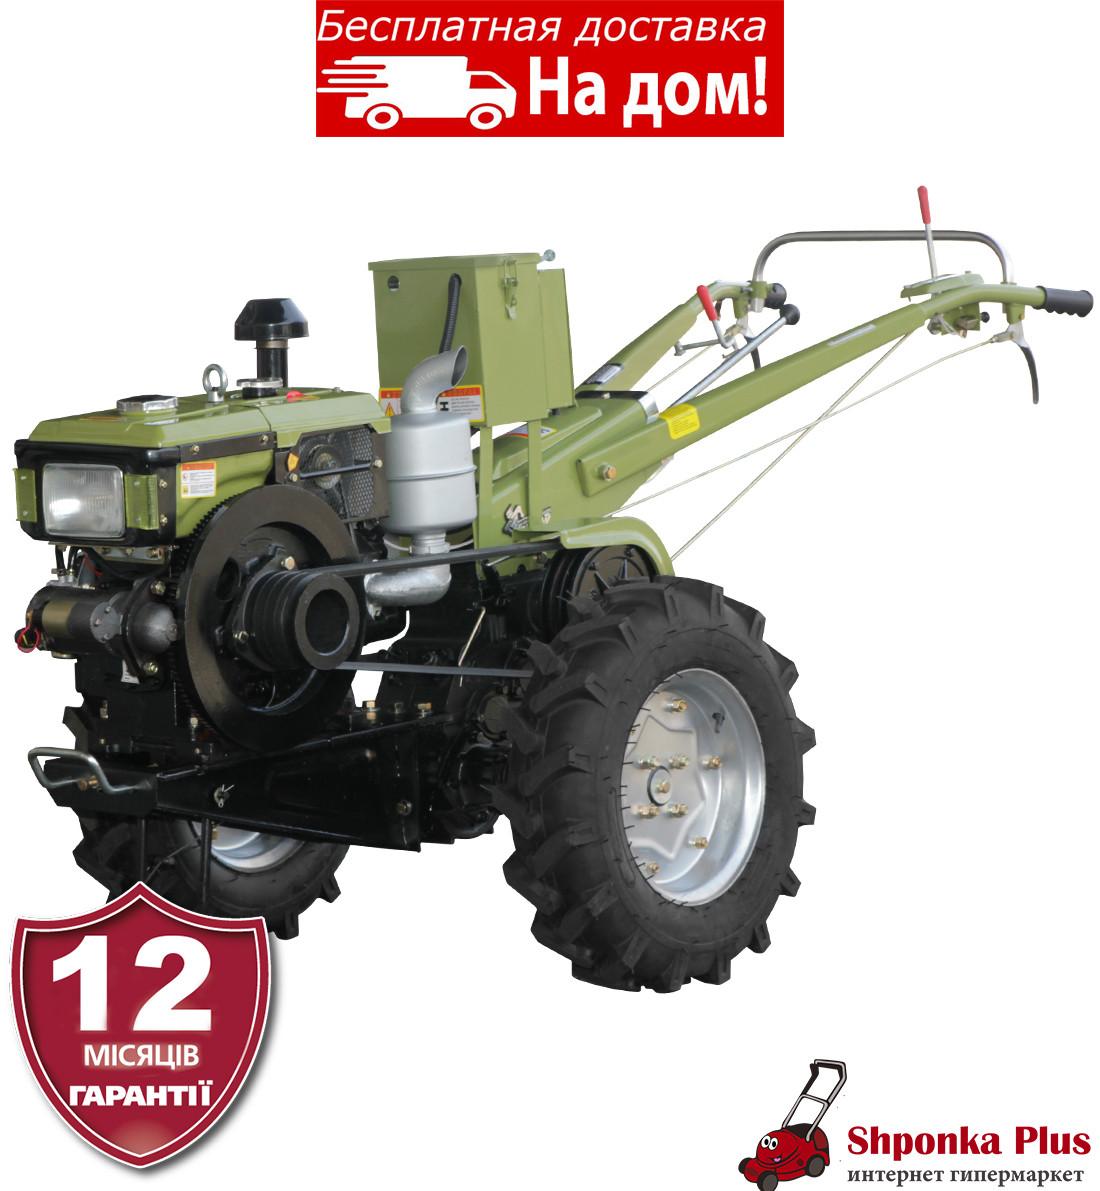 Мотоблок 12л.с., без  фрезы, электростартер Кентавр МБ 1012Е